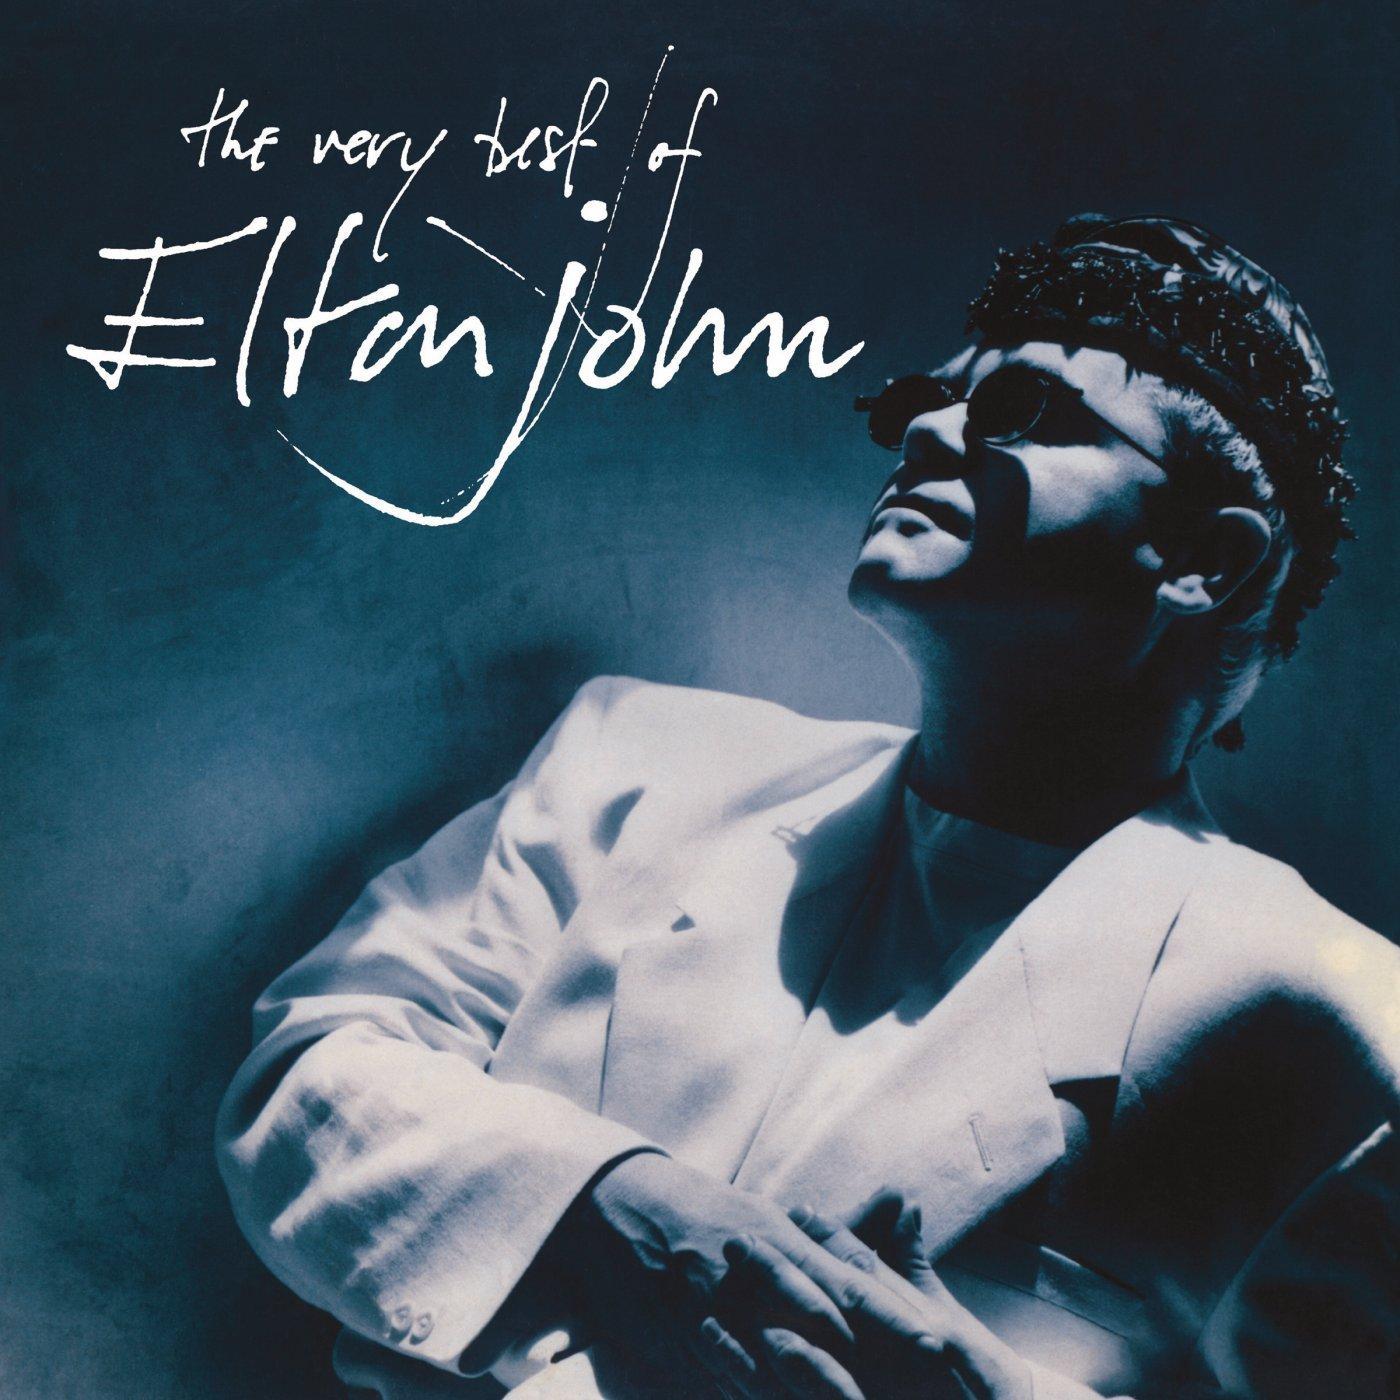 Download Elton John The Very Best Of Elton John 1990